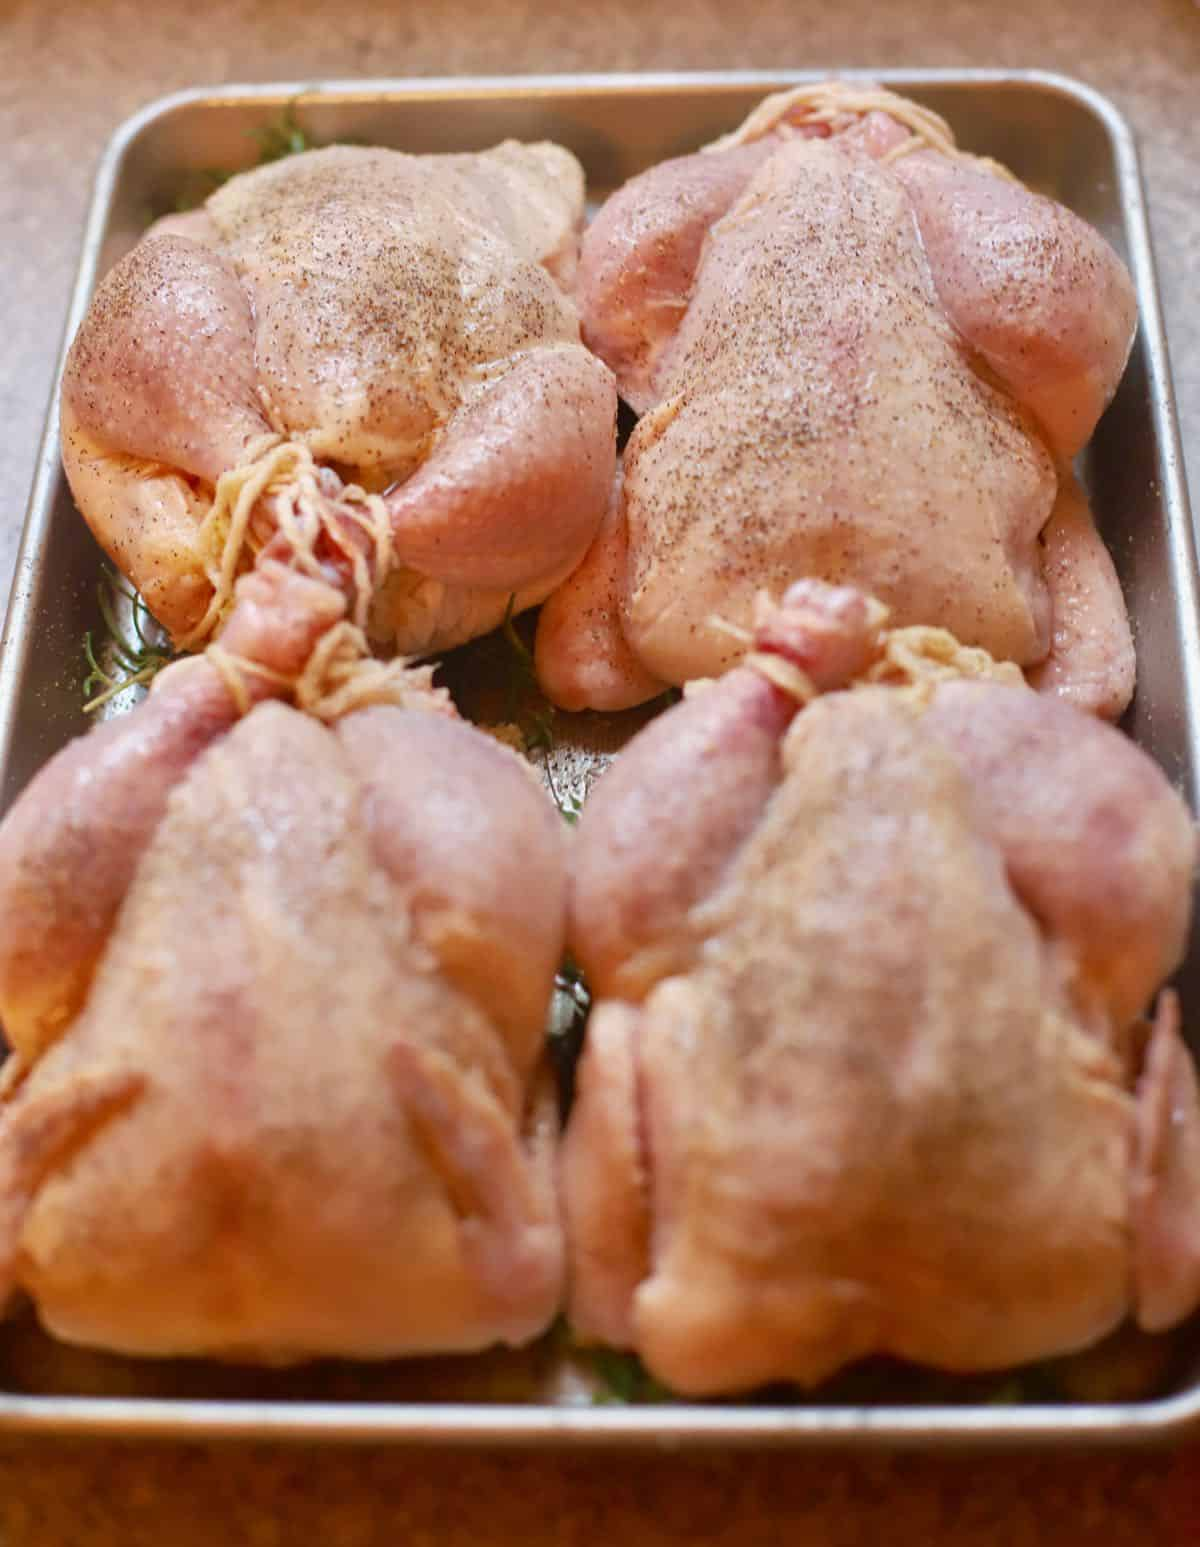 Four Cornish hens in a baking pan.